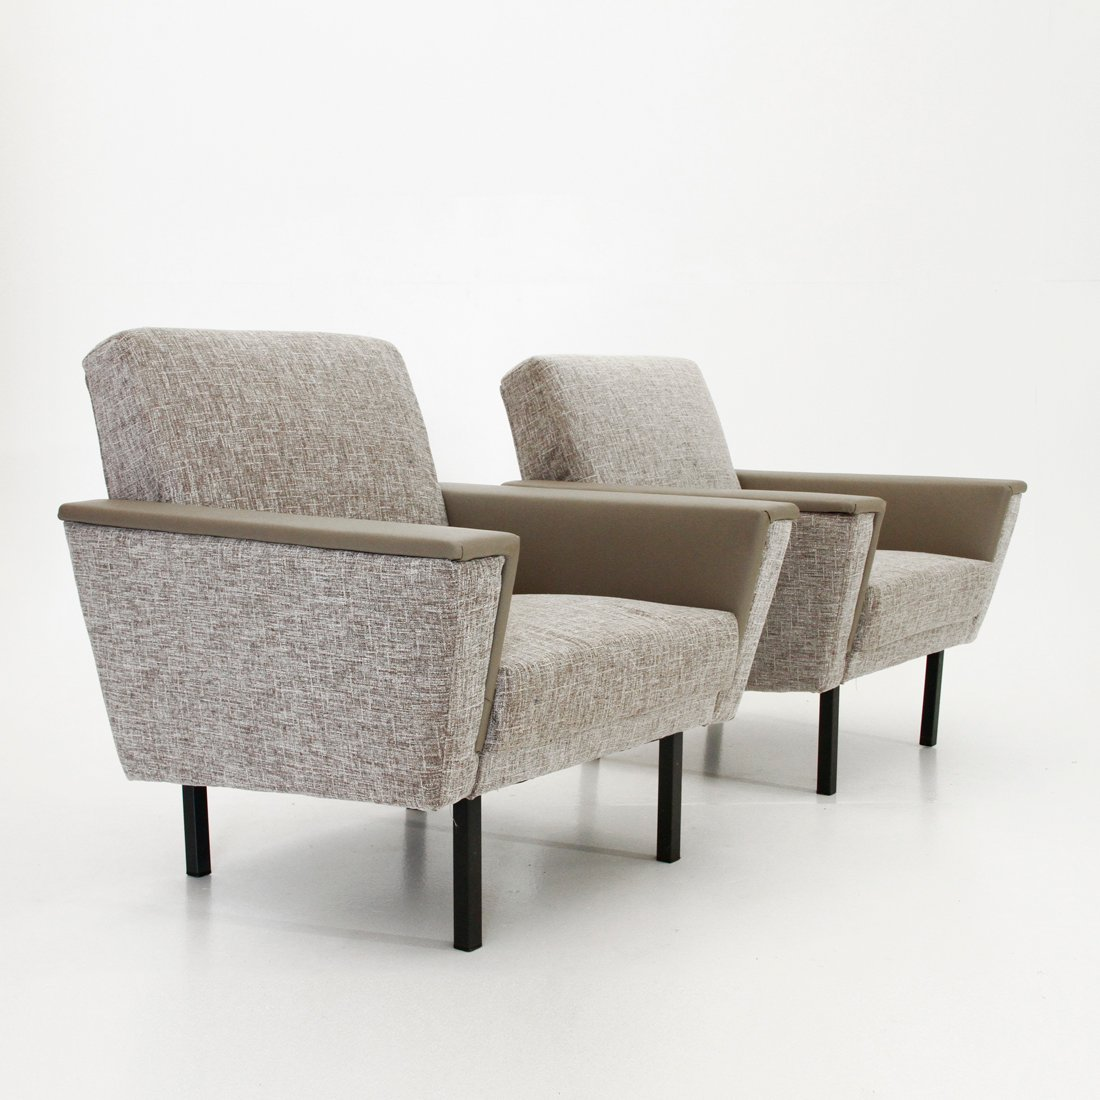 graue mid century sessel 1950er 2er set bei pamono kaufen. Black Bedroom Furniture Sets. Home Design Ideas